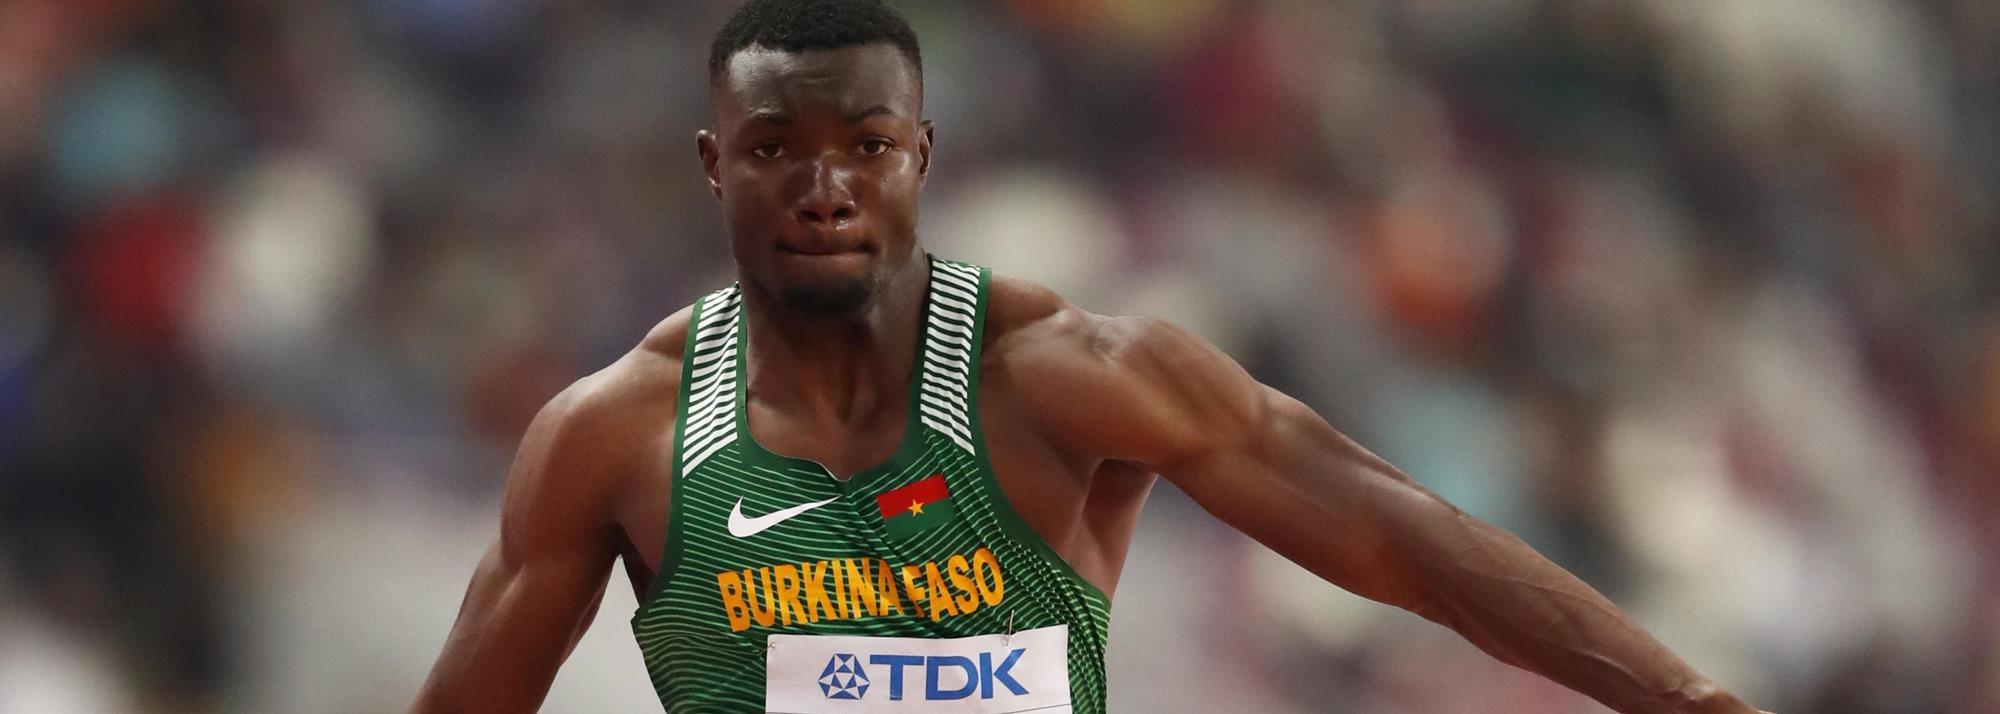 After Doha bronze, Zango targeting Tokyo podium